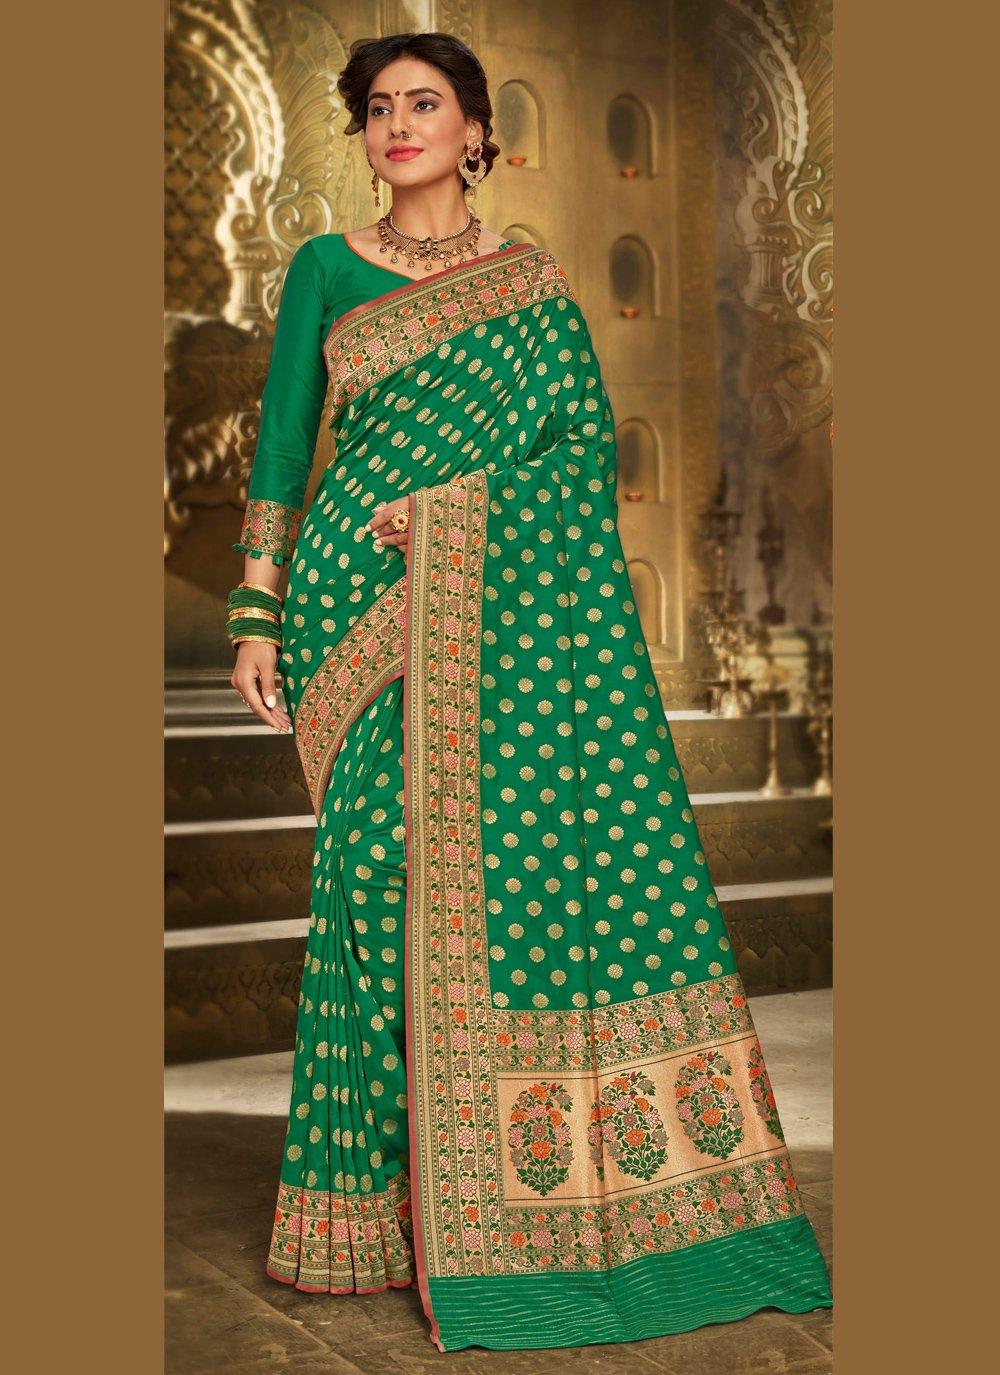 Brocade Green Embroidered Trendy Saree